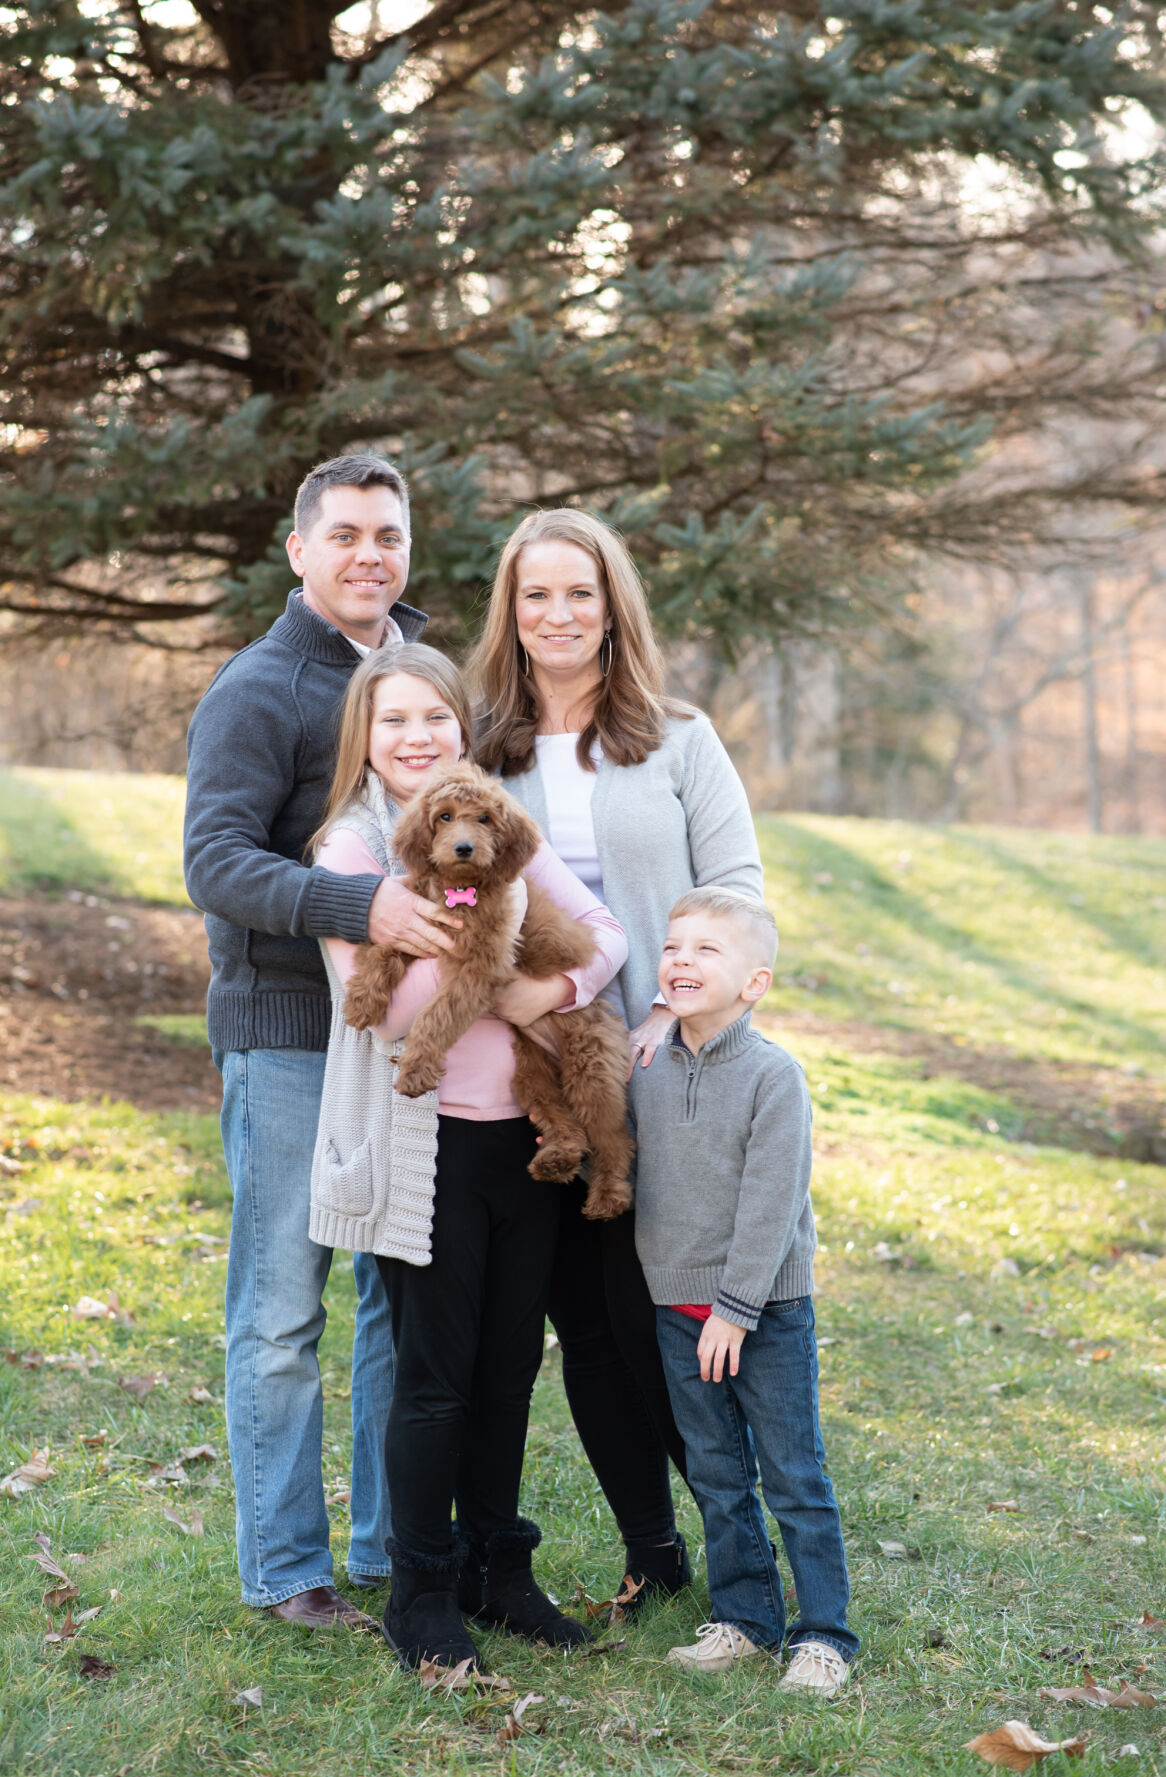 Brandon Fletcher and his family